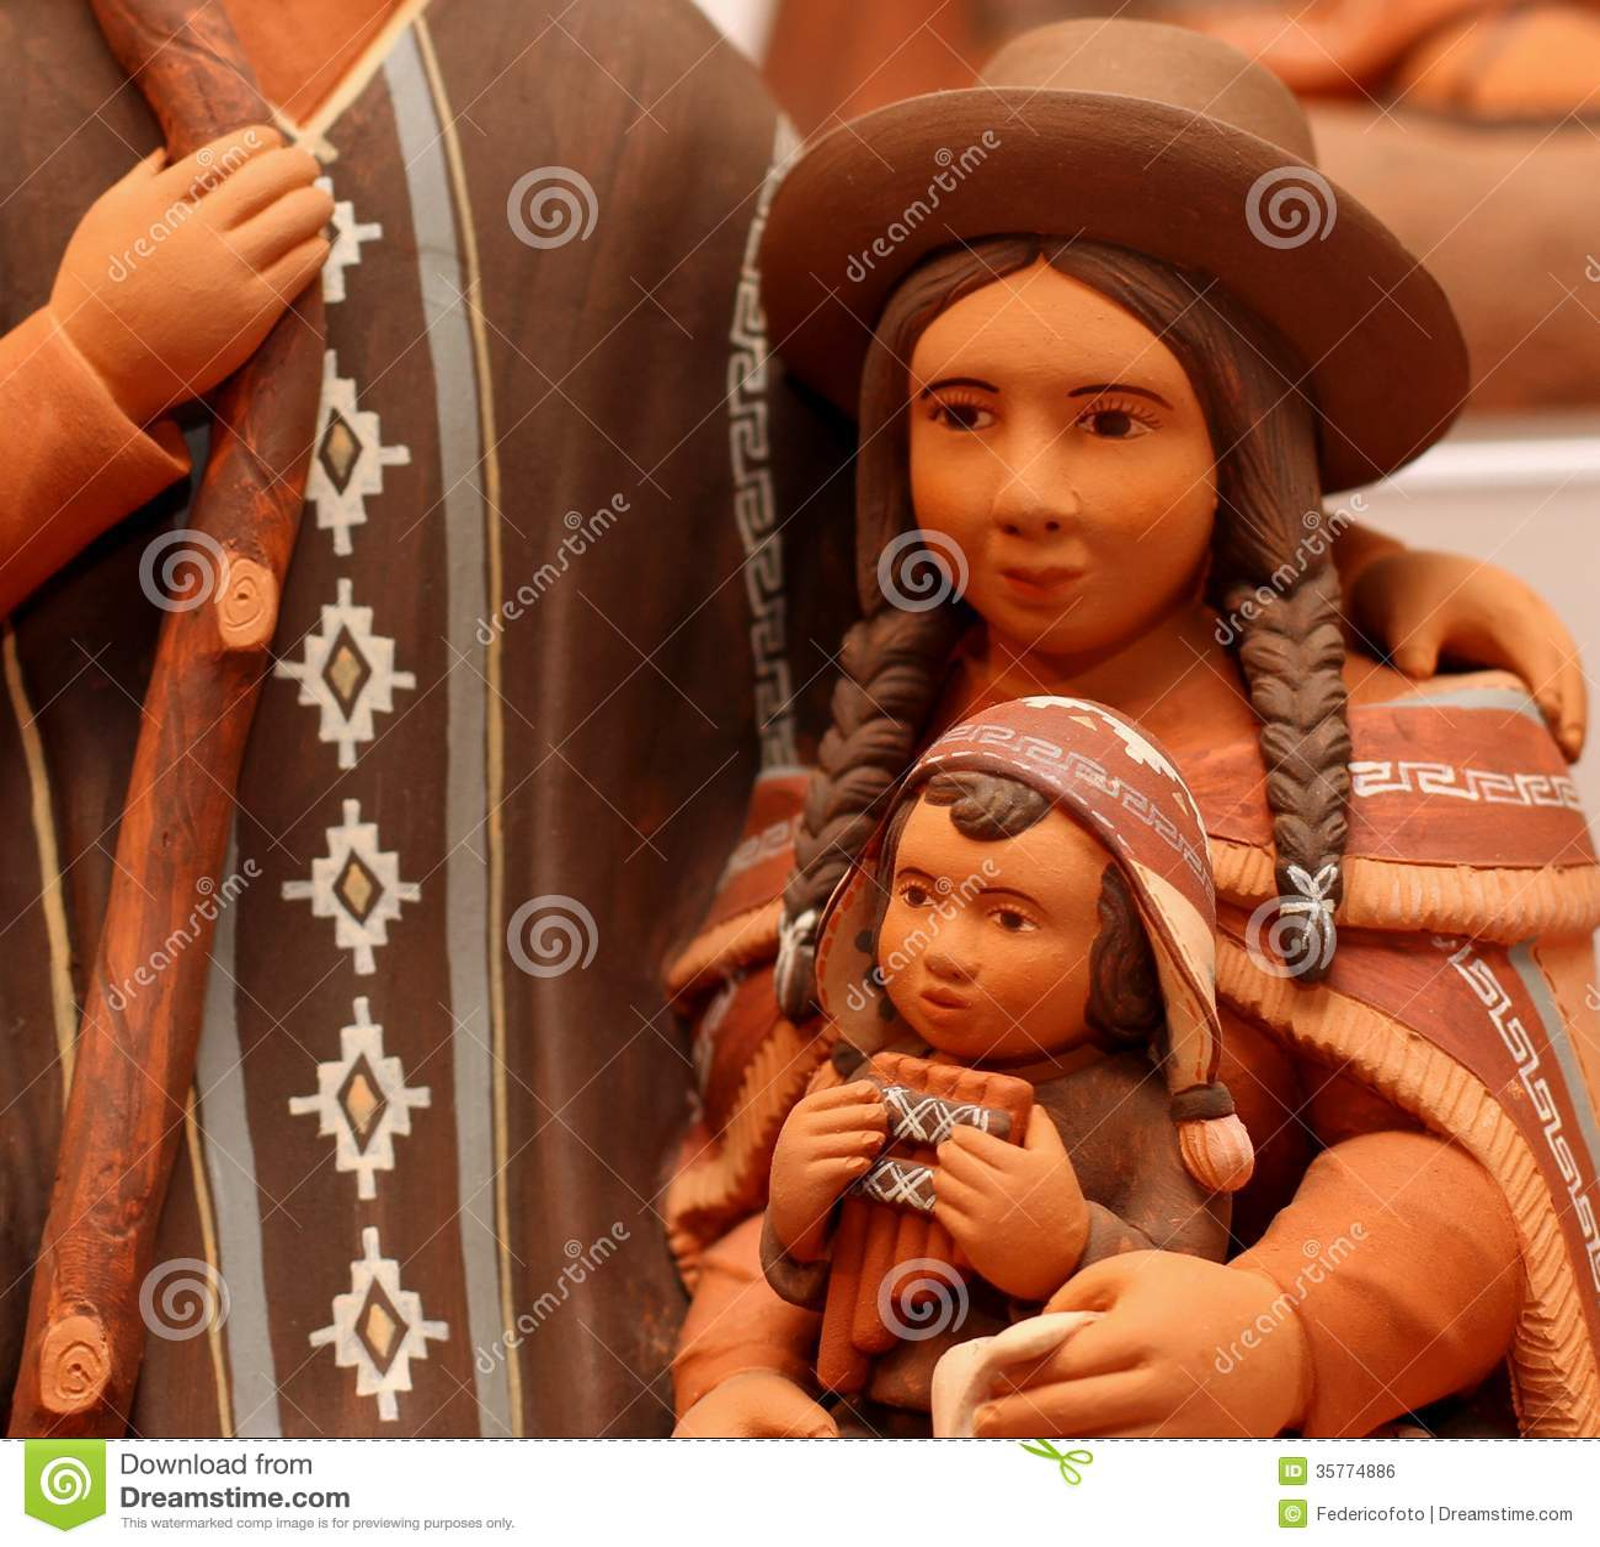 Mary and baby Jesus in bolivia terracotta handmade